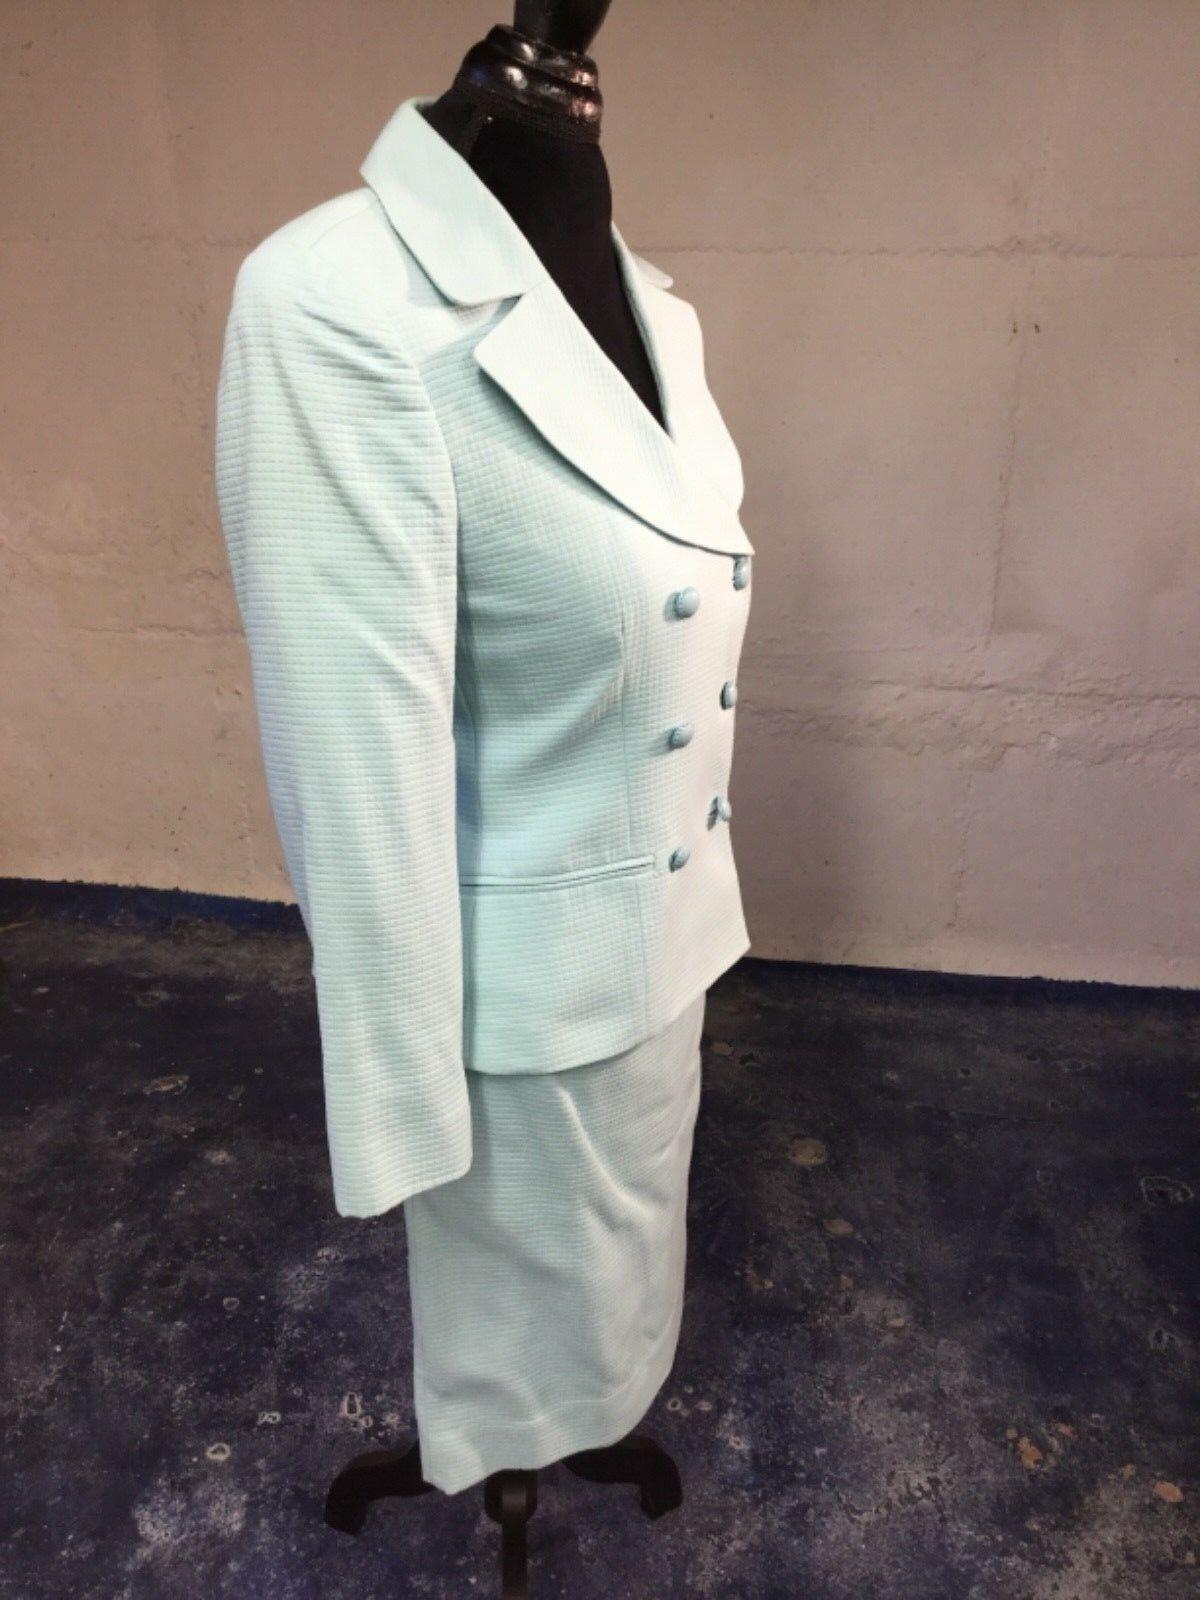 Worth New York Rare Aqua Double Breasted Cotton Cotton Cotton Suit 2 6 432b34